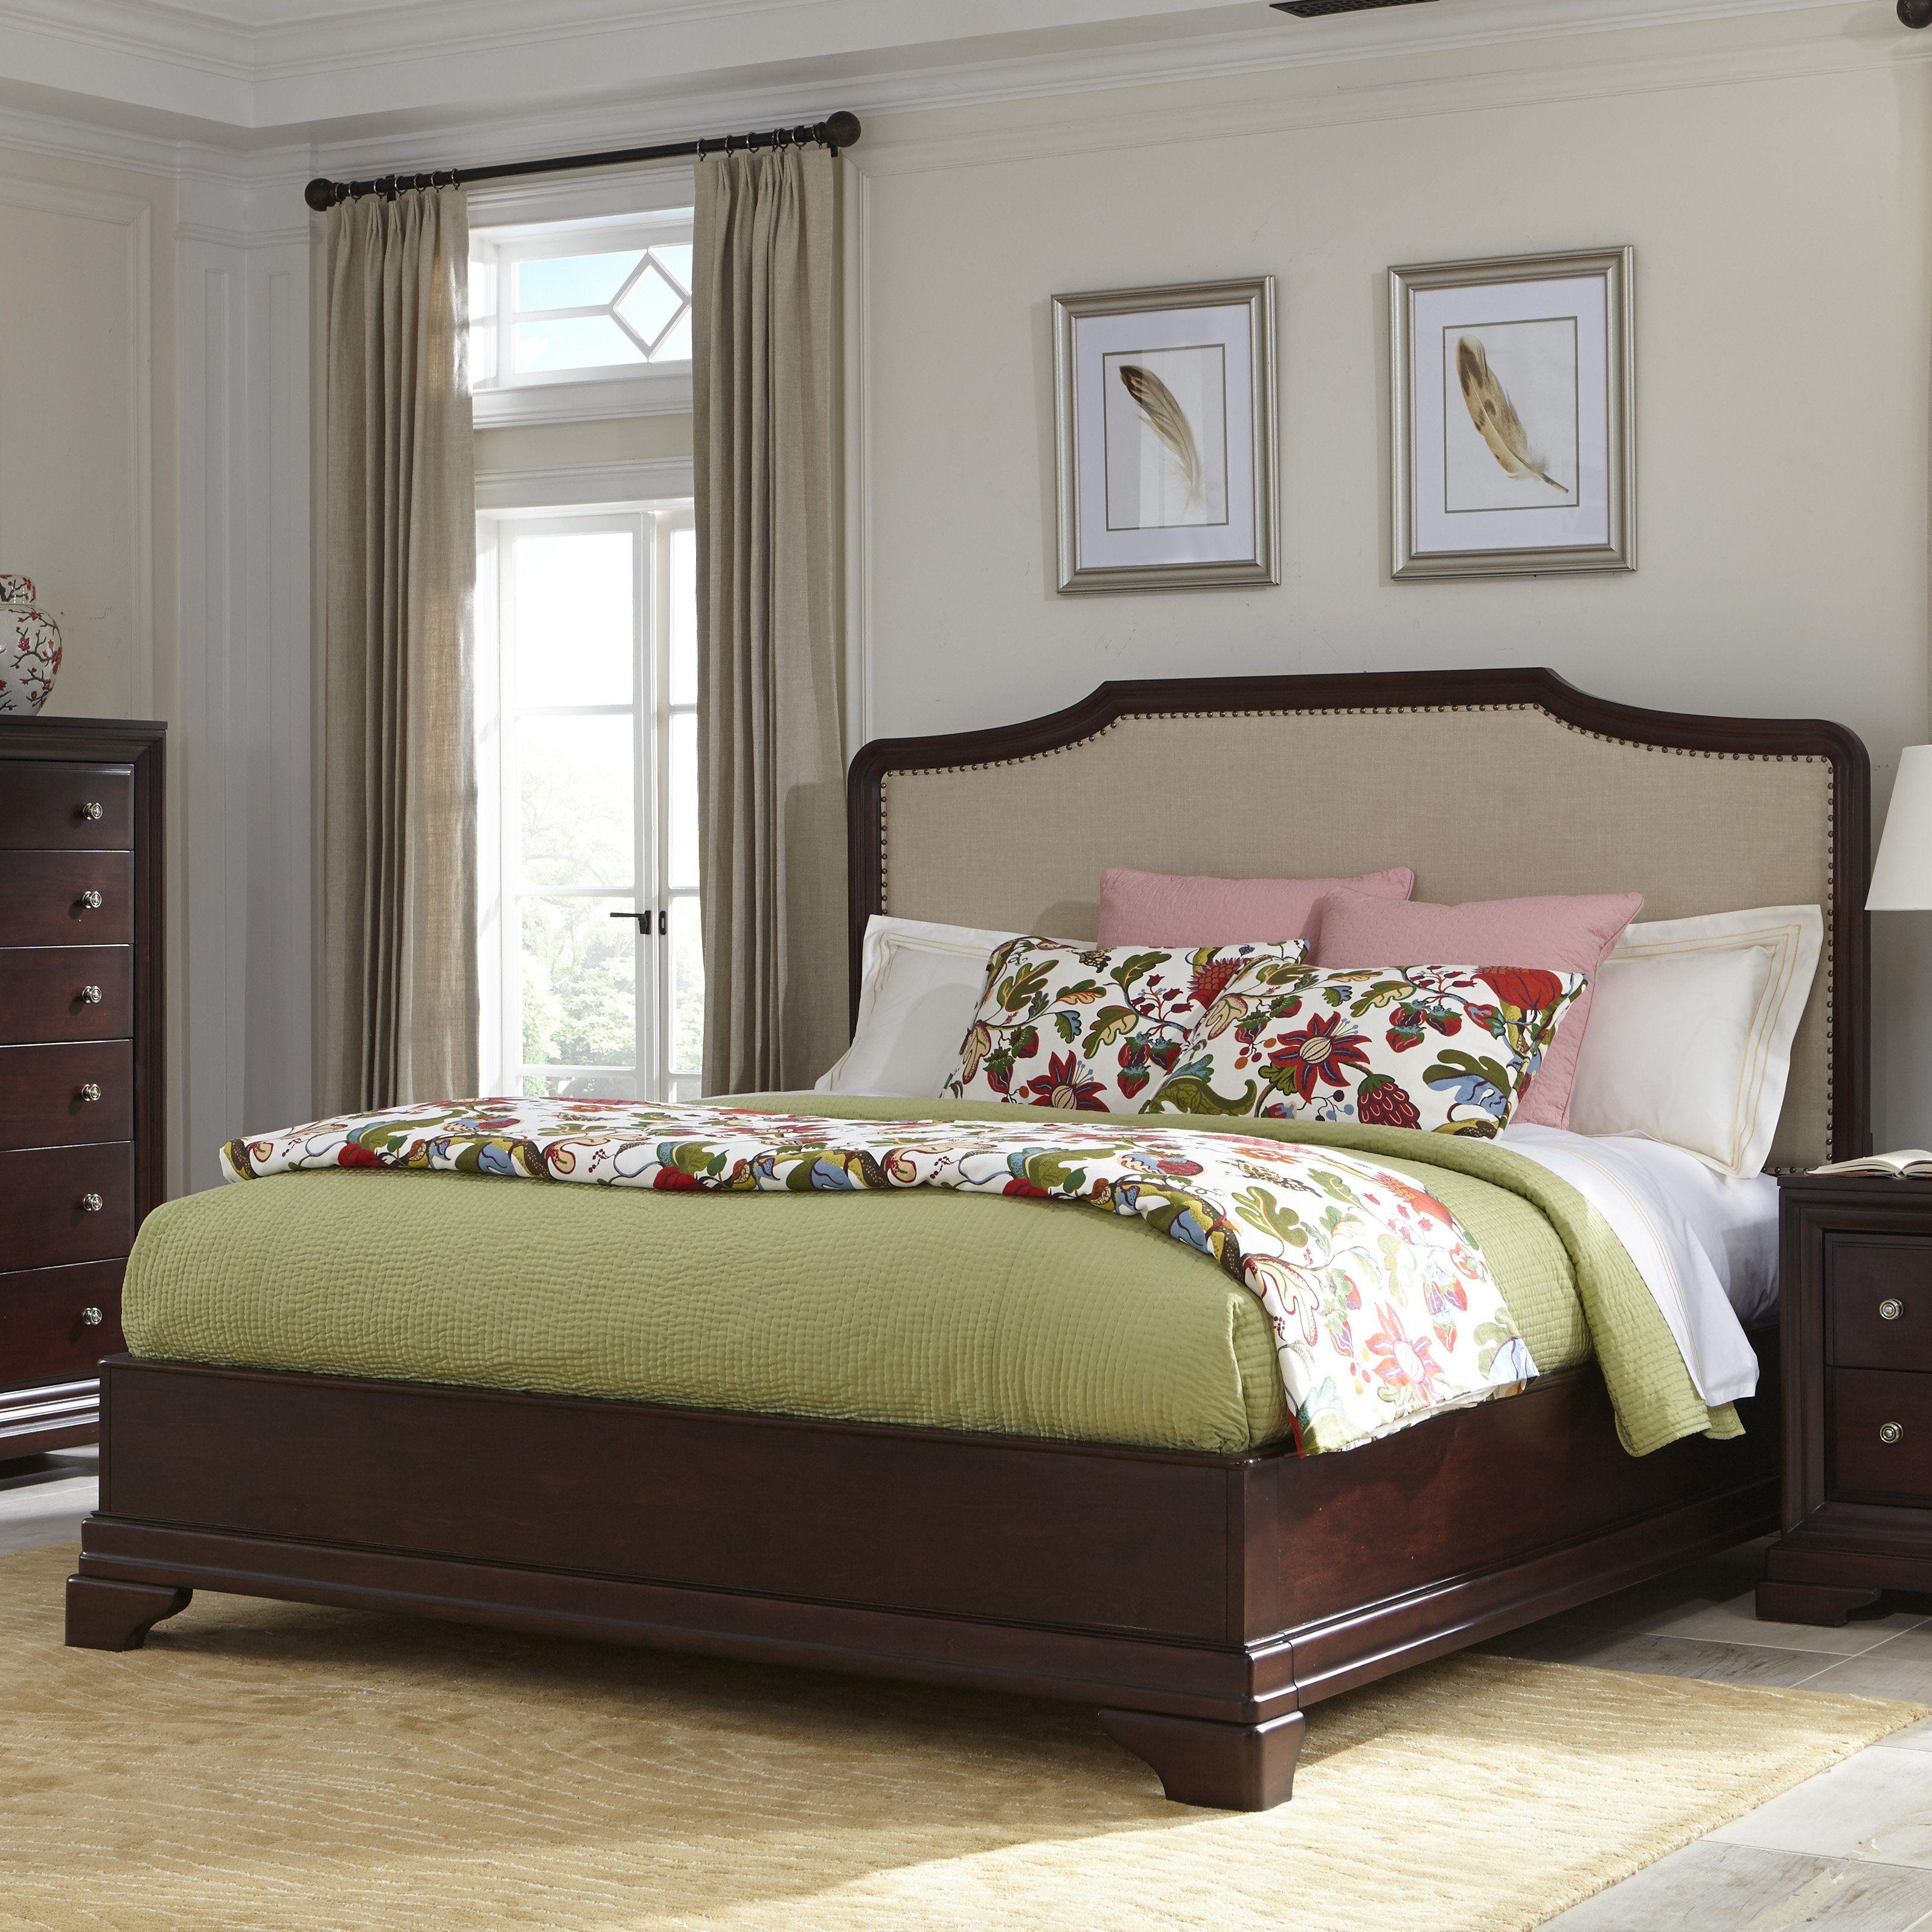 Cresent Fine Furniture Newport Upholstered Storage Bed From Hayneedle Com Cresent Furniture Solid Wood Bedroom Furniture Upholstered Bedroom Set